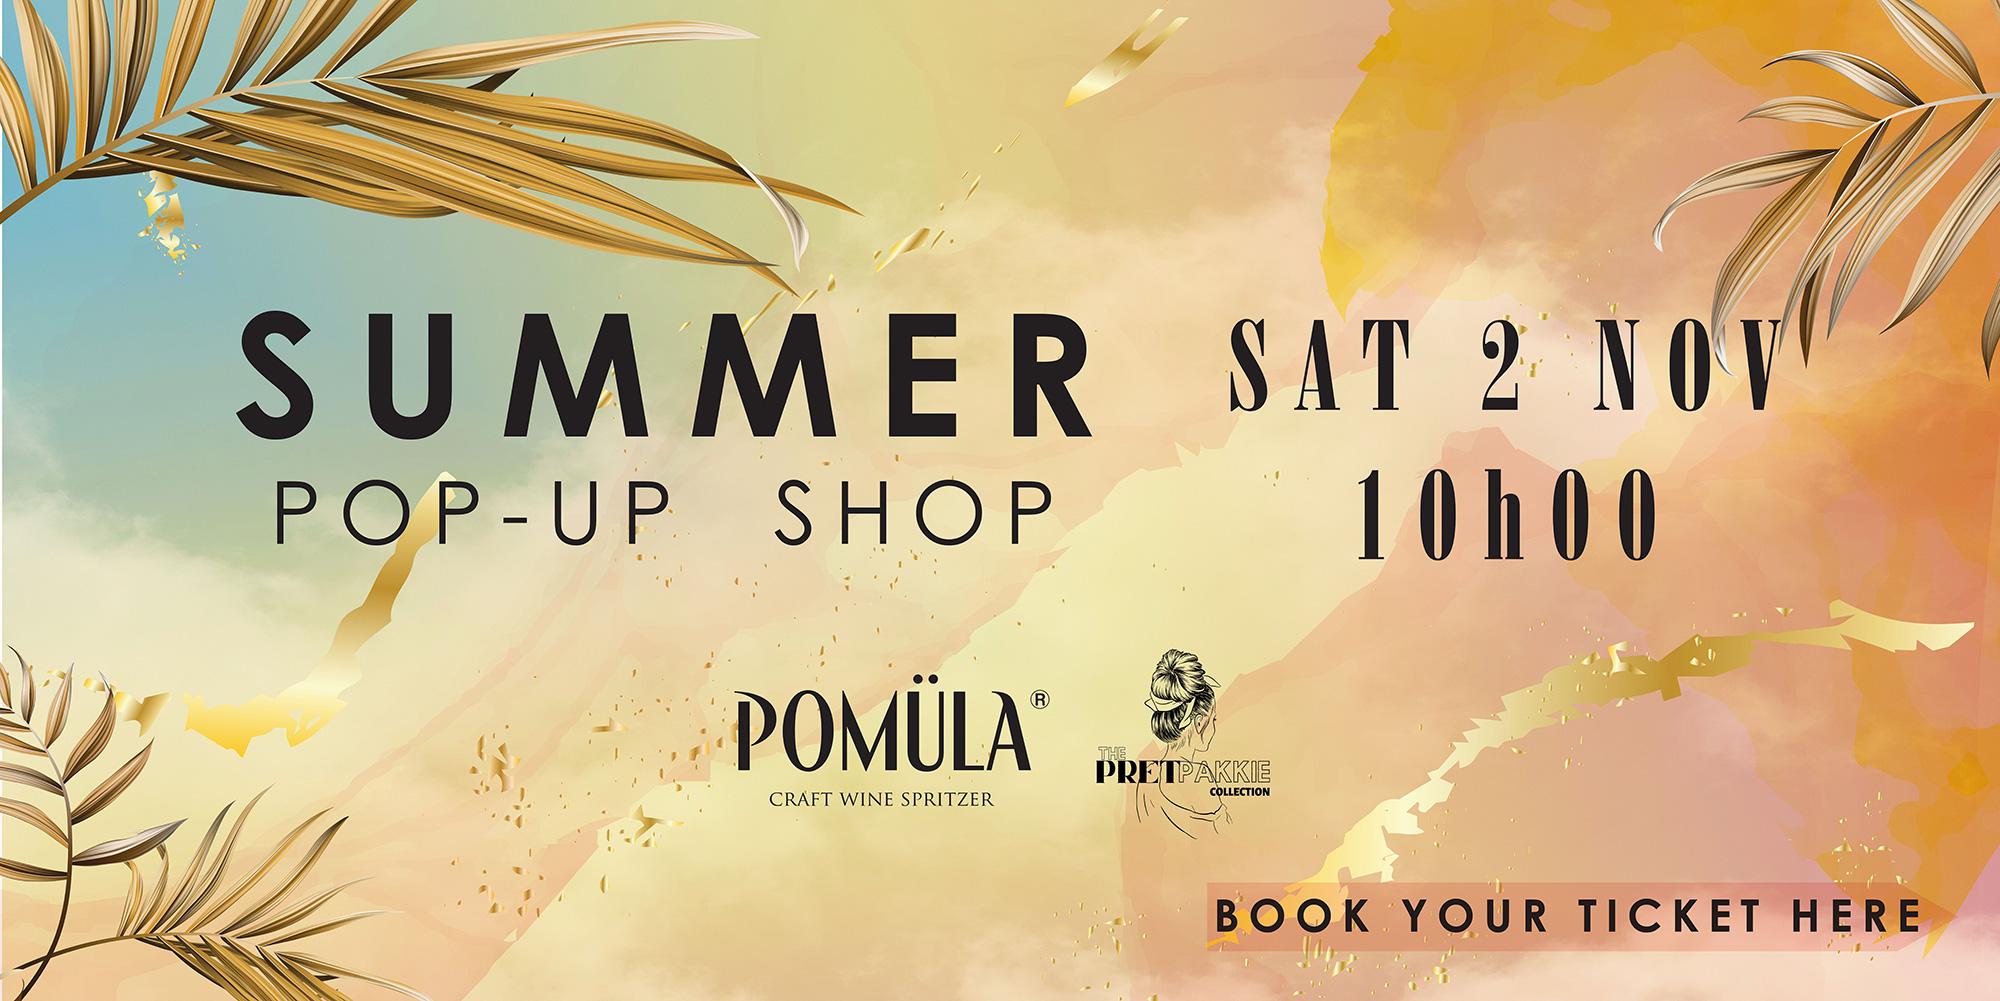 Pomula-Pop-of-Summer-website-banner-02